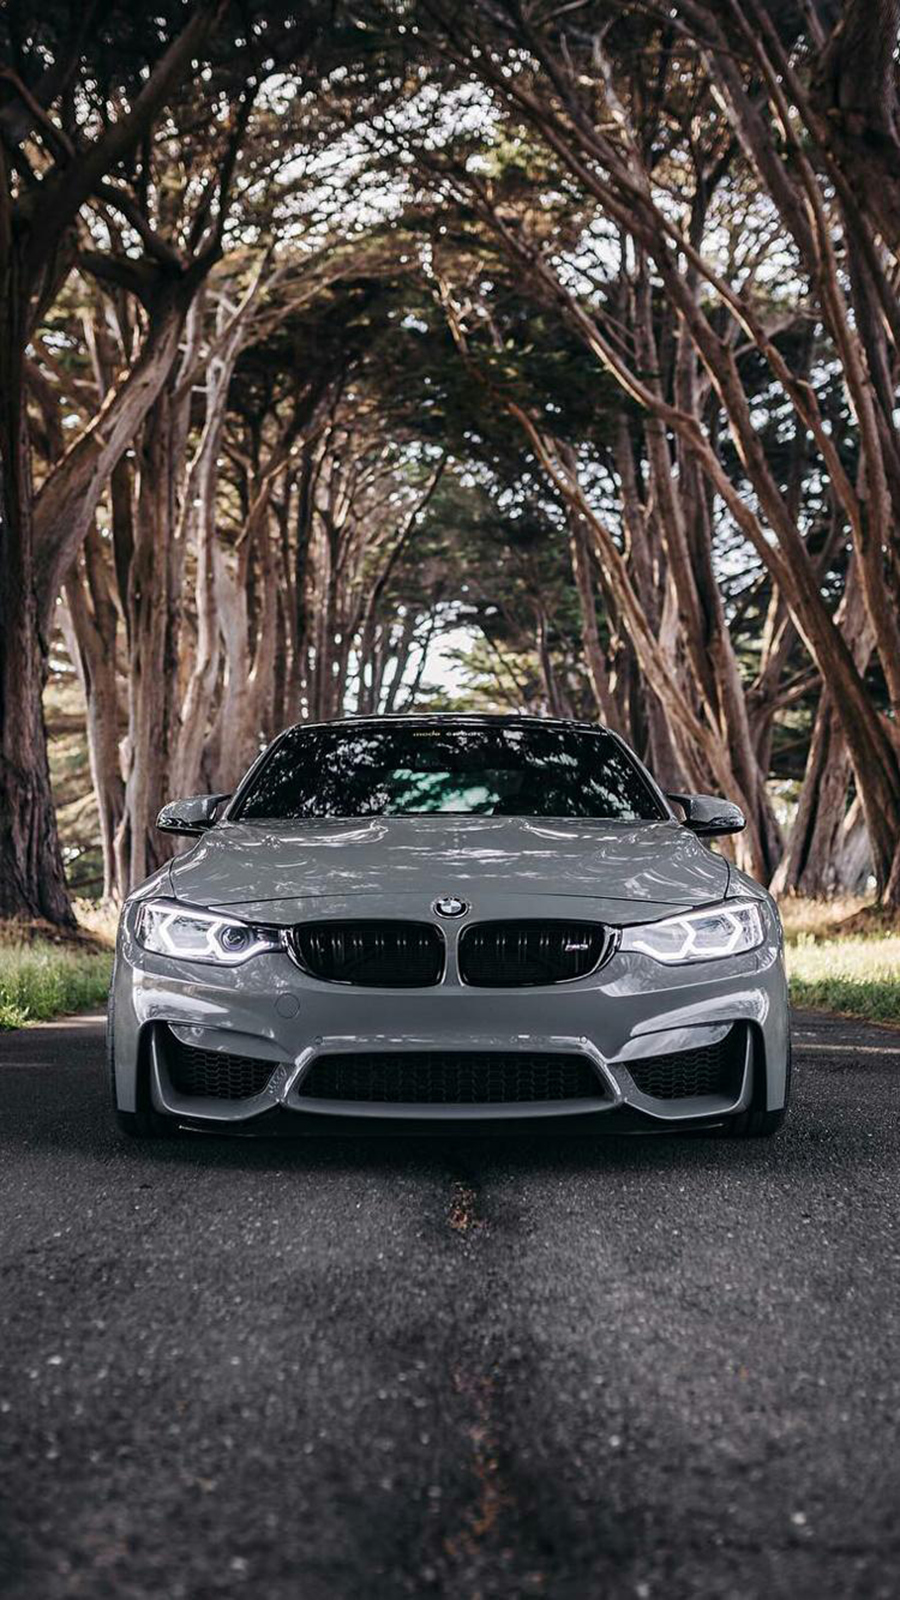 4K Bmw Wallpaper – Most Popular BMW Wallpapers Free Download